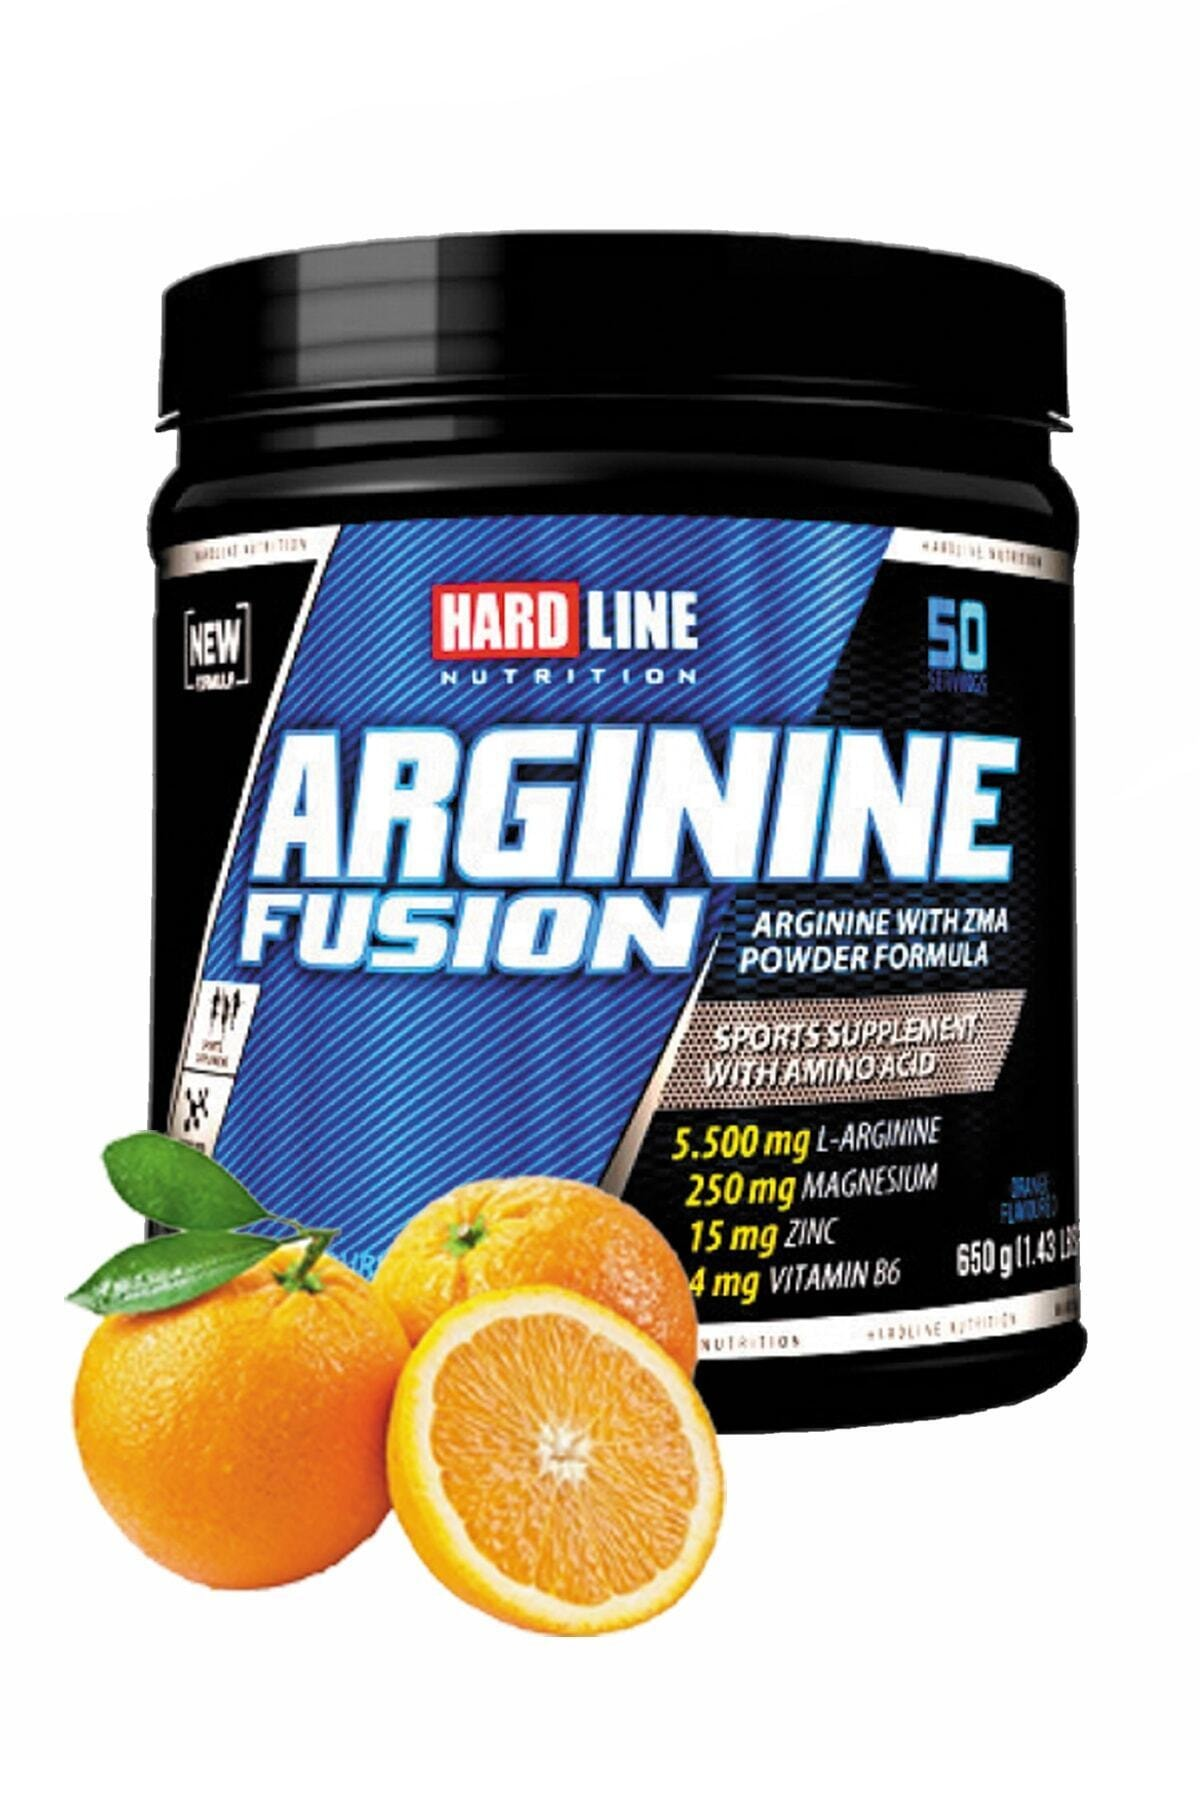 Hardline Arginine Fusıon Portakal 650 Gr Arjinin Bcaa Amino Aminoasit Magnezyum Çinko Vitamin B6 1